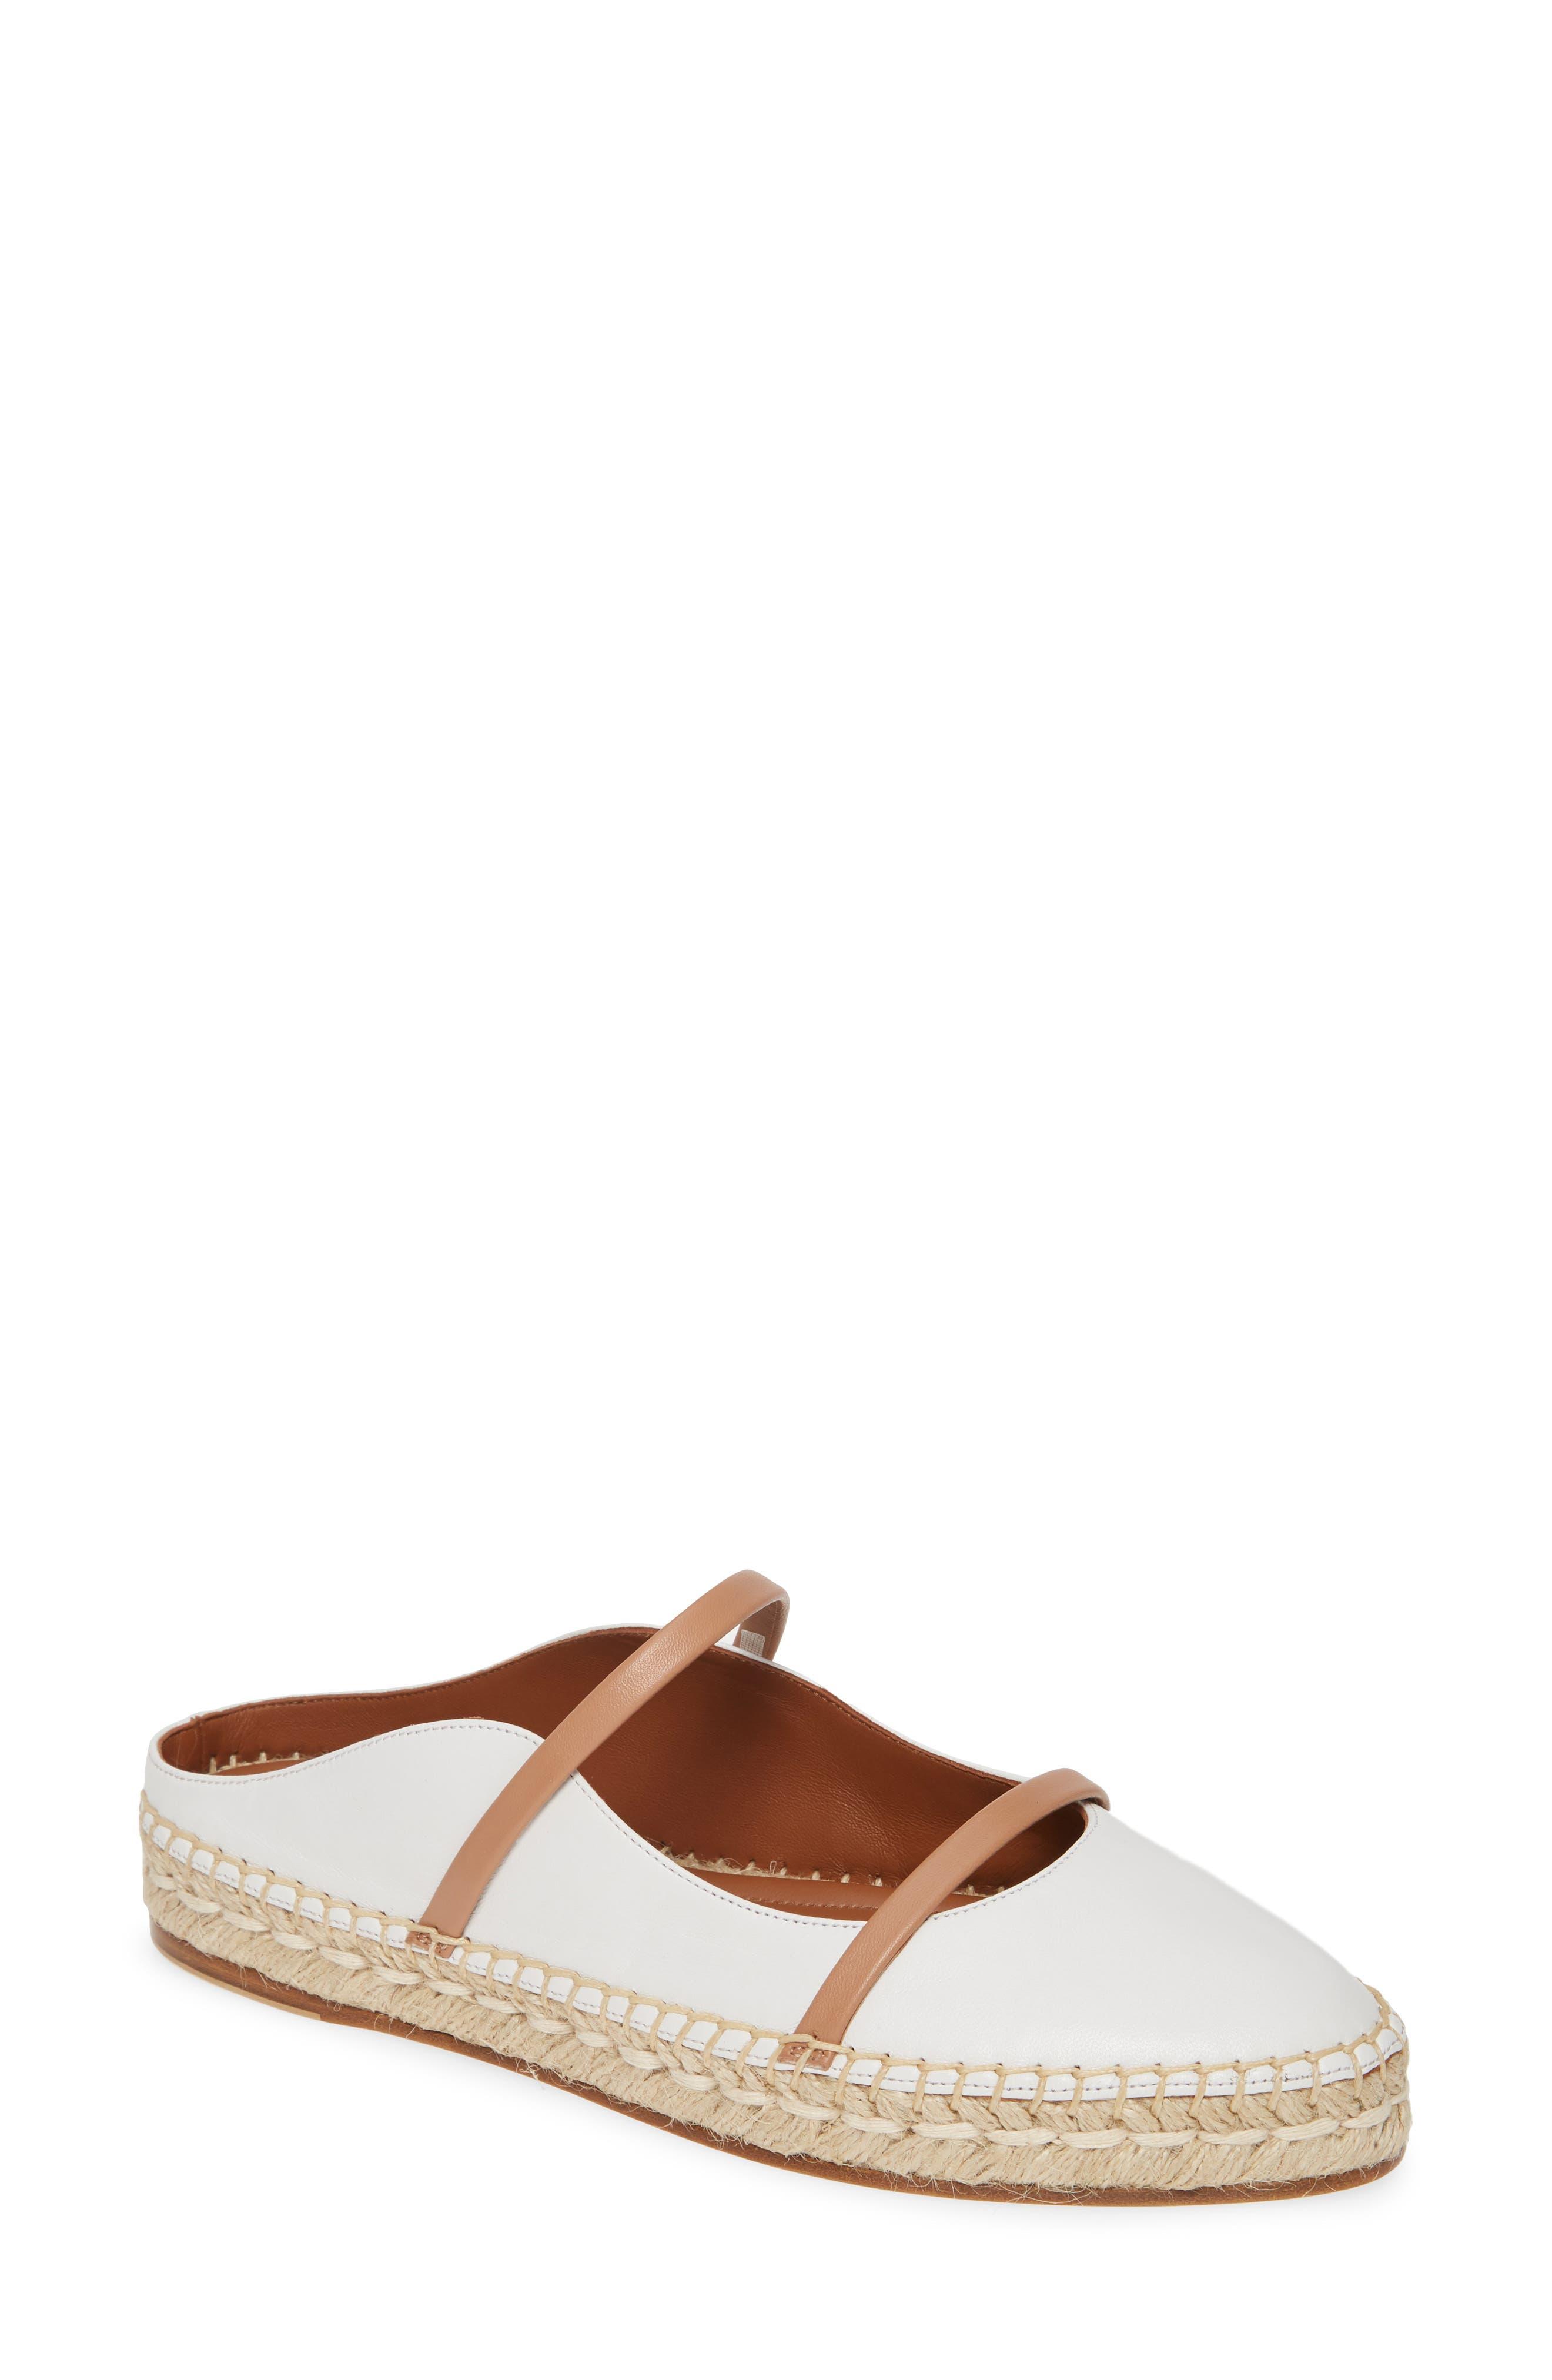 Malone Souliers Siena Espadrille Flat - White